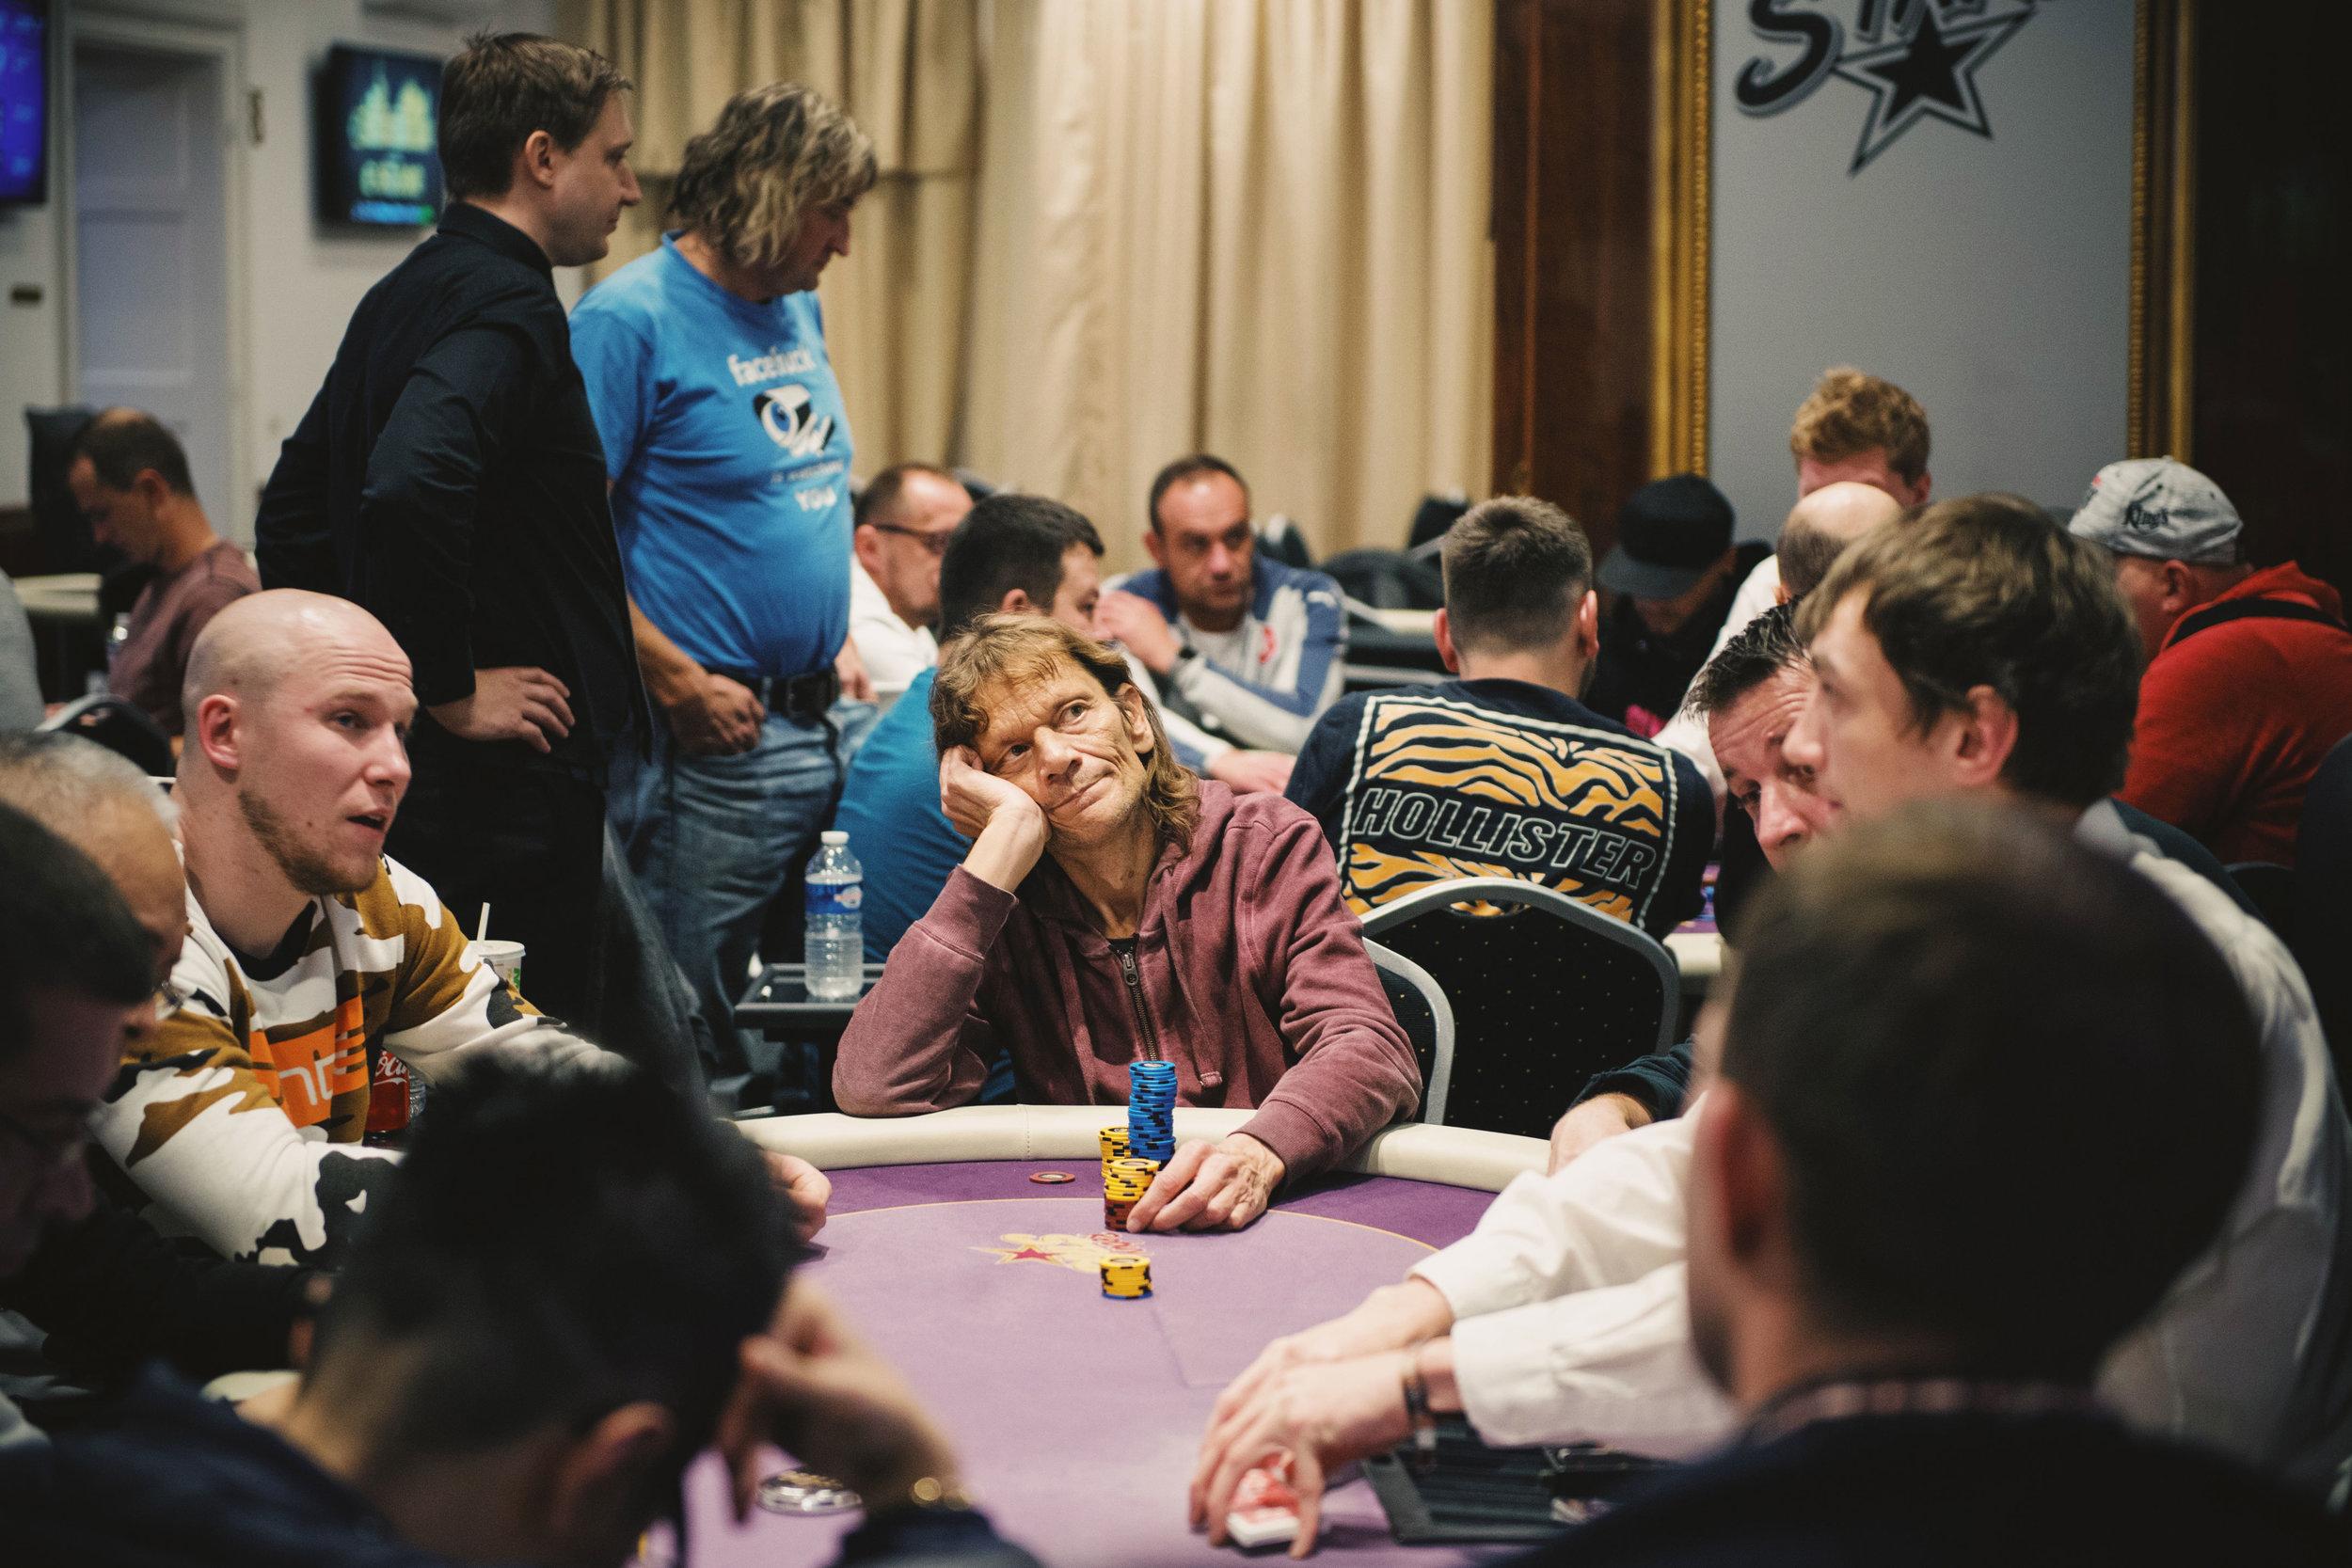 poker-photographer-eu-polina-shubkina-009.jpg